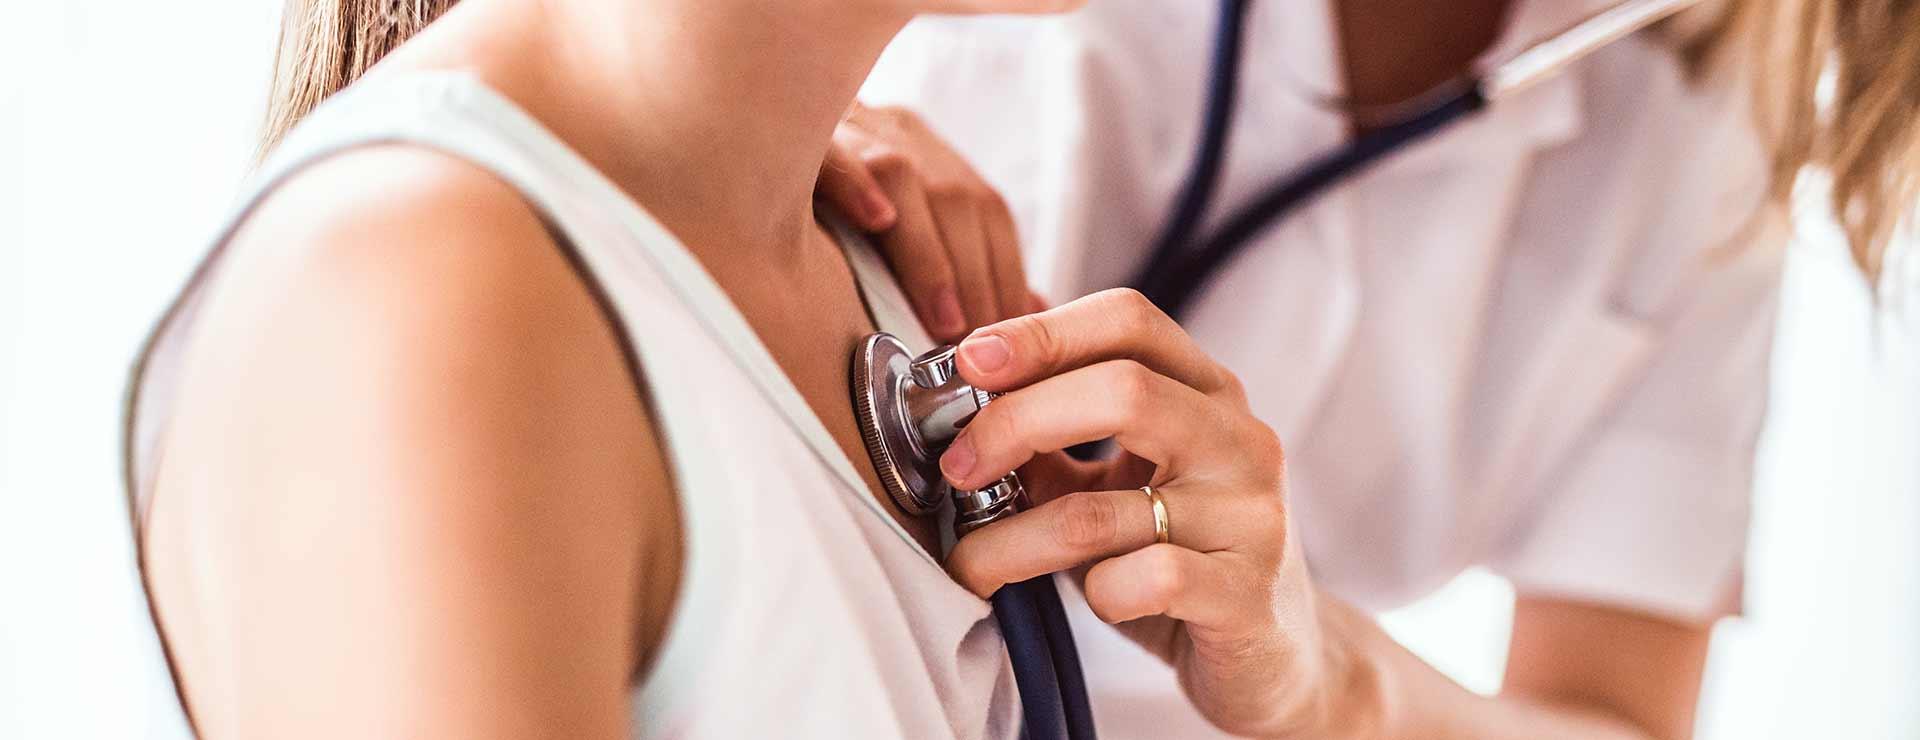 Loop Recorder Implantation | Johns Hopkins Medicine